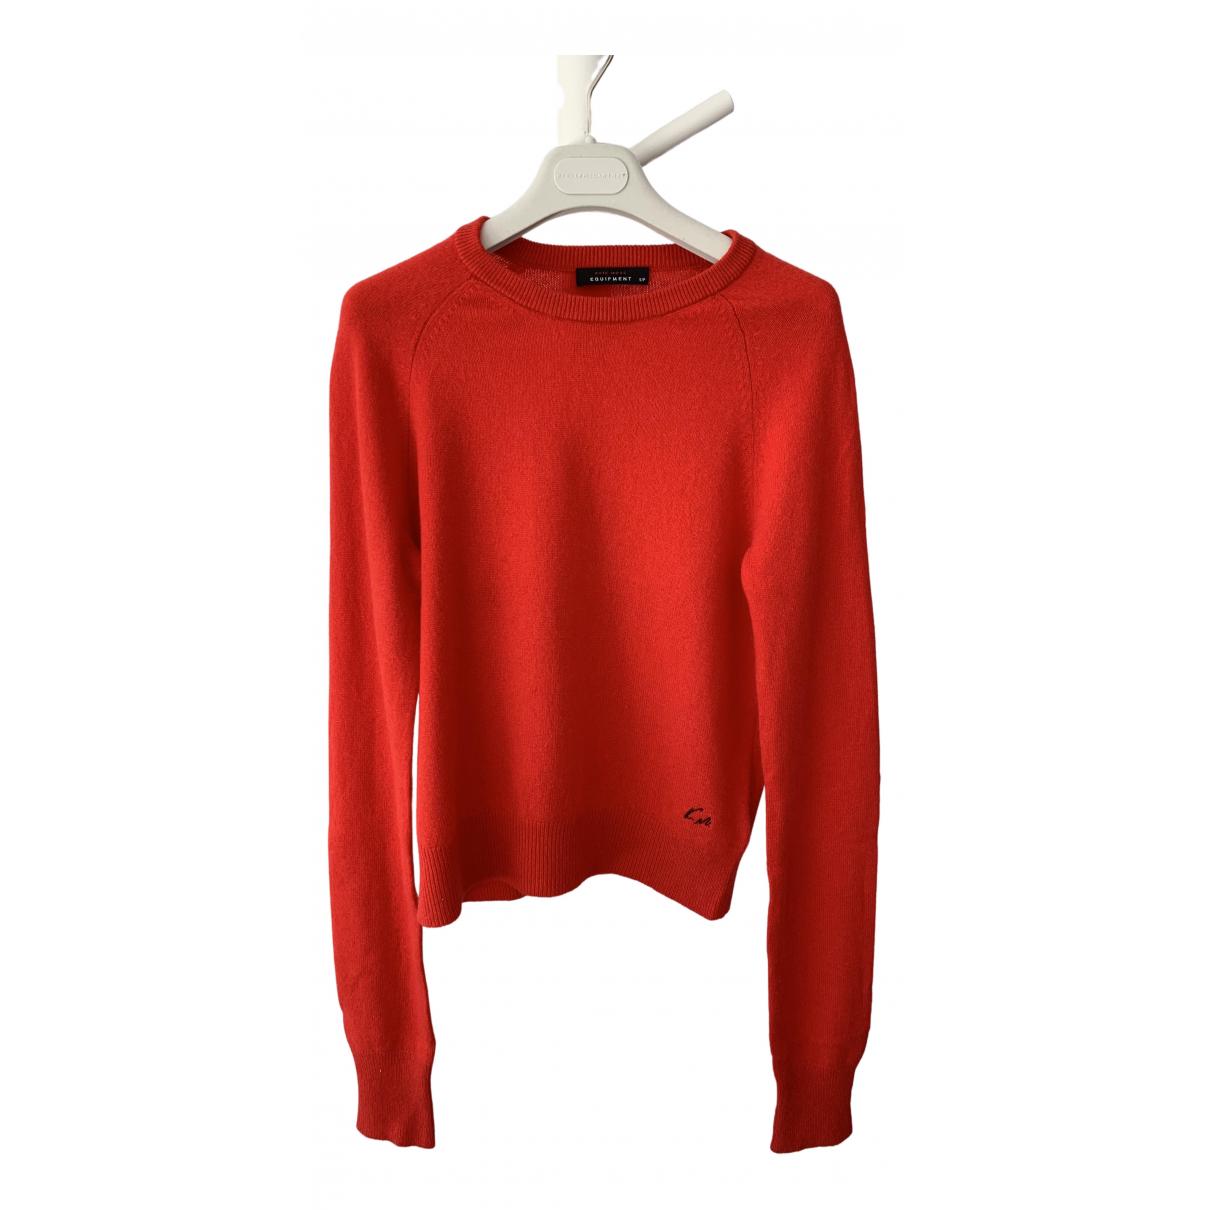 Equipment N Red Cashmere Knitwear for Women S International